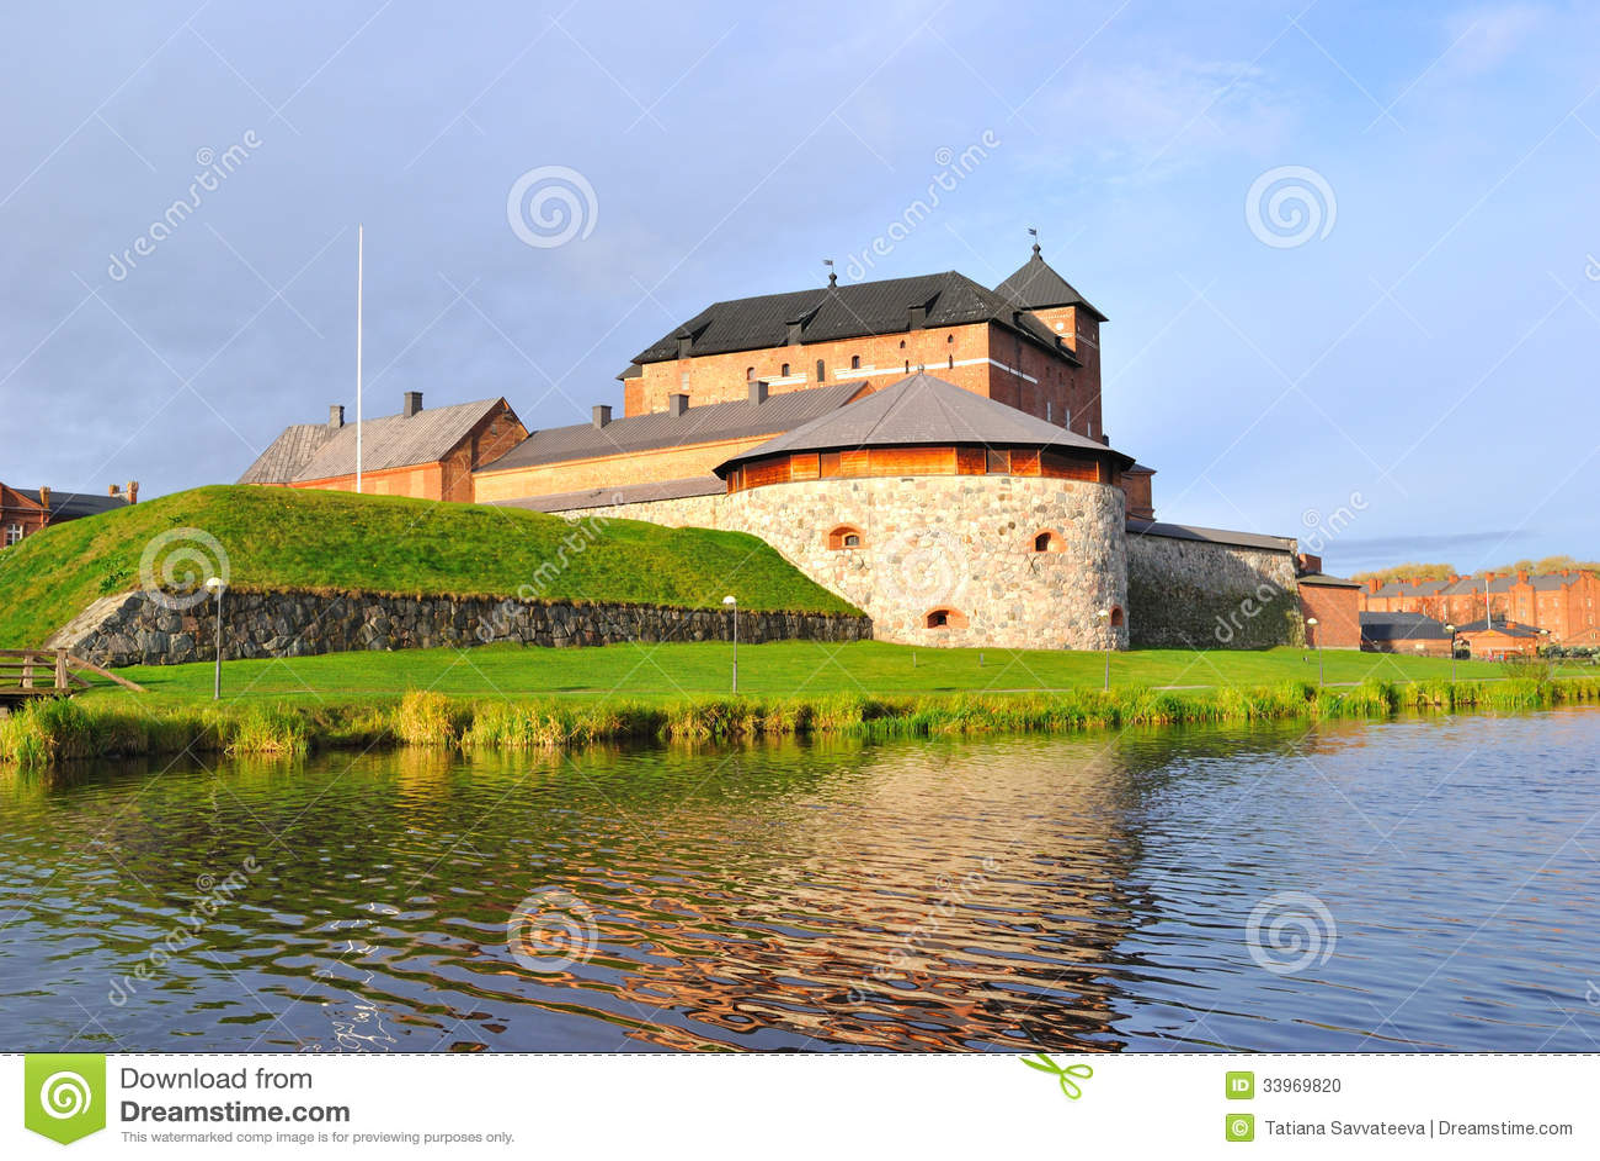 Finlandia. Hameenlinna medieval